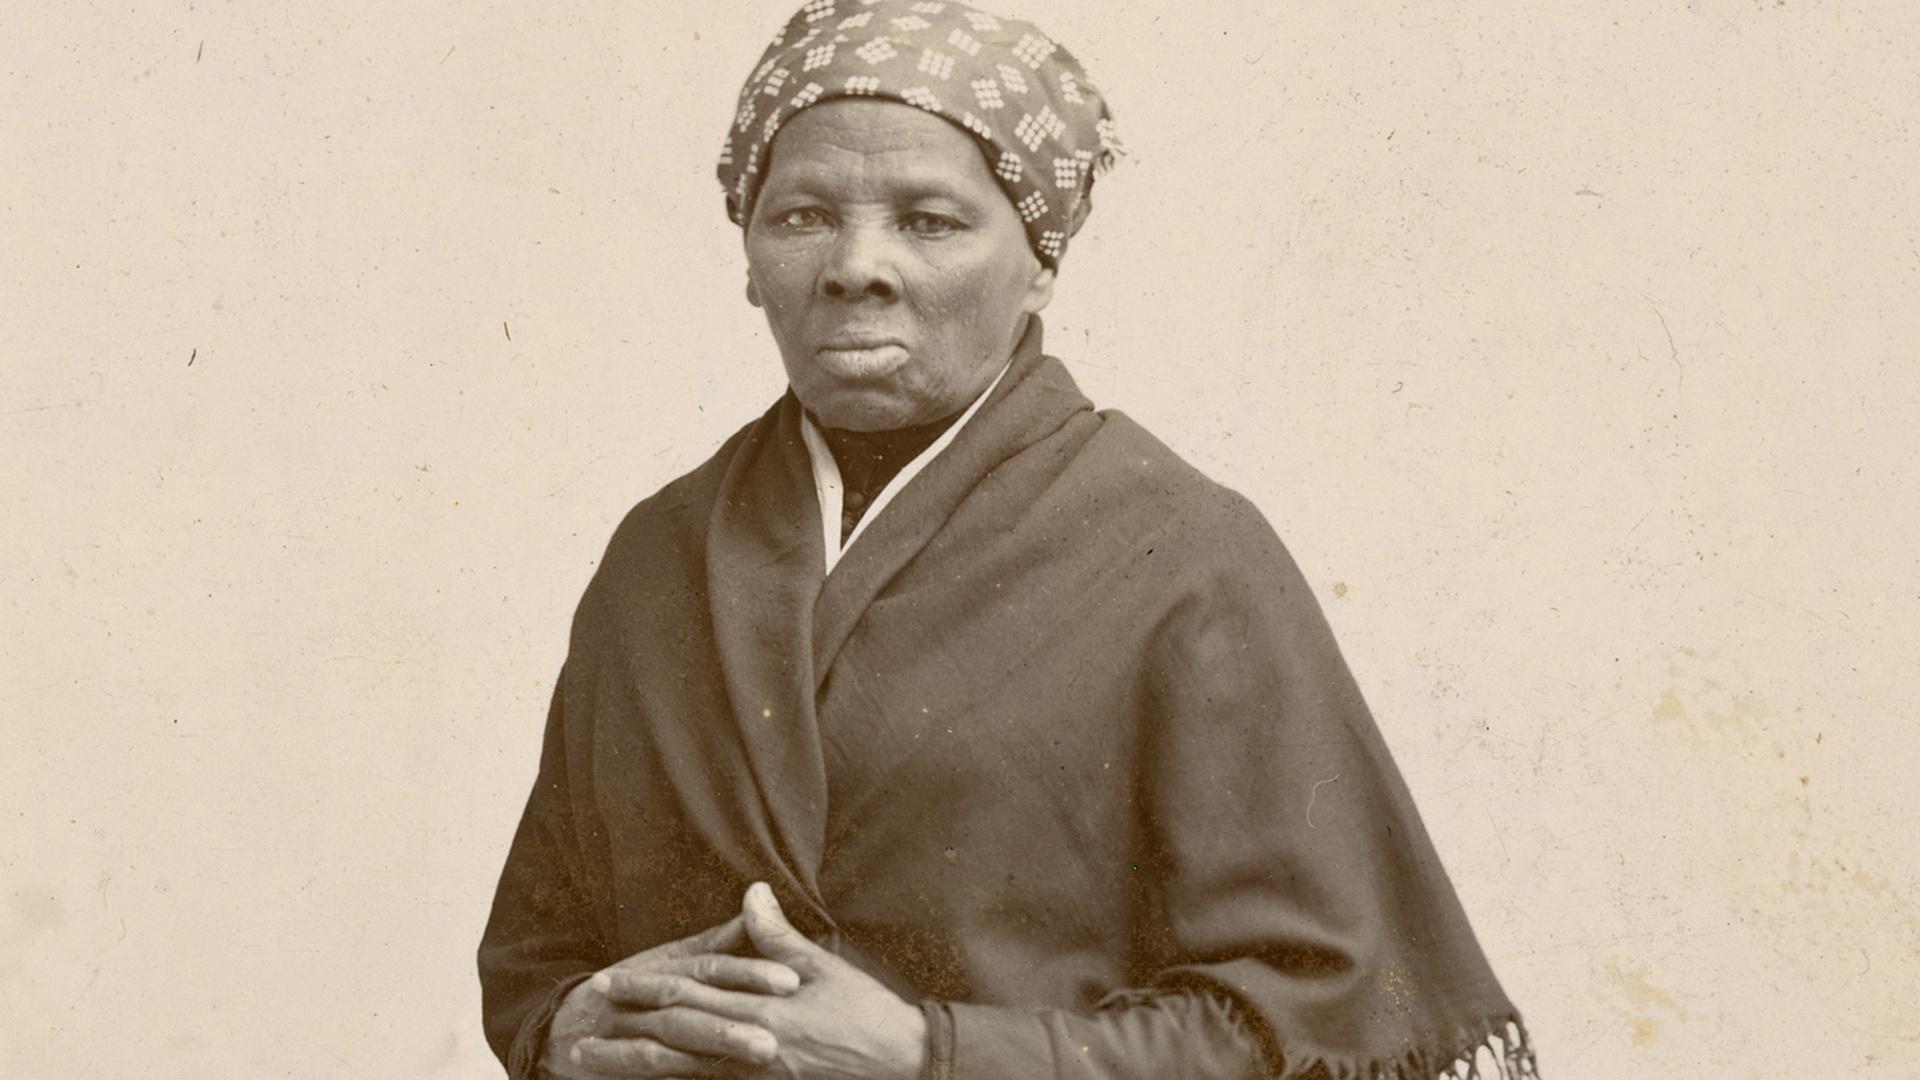 American abolitionist and political activist, Harriet Tubman.